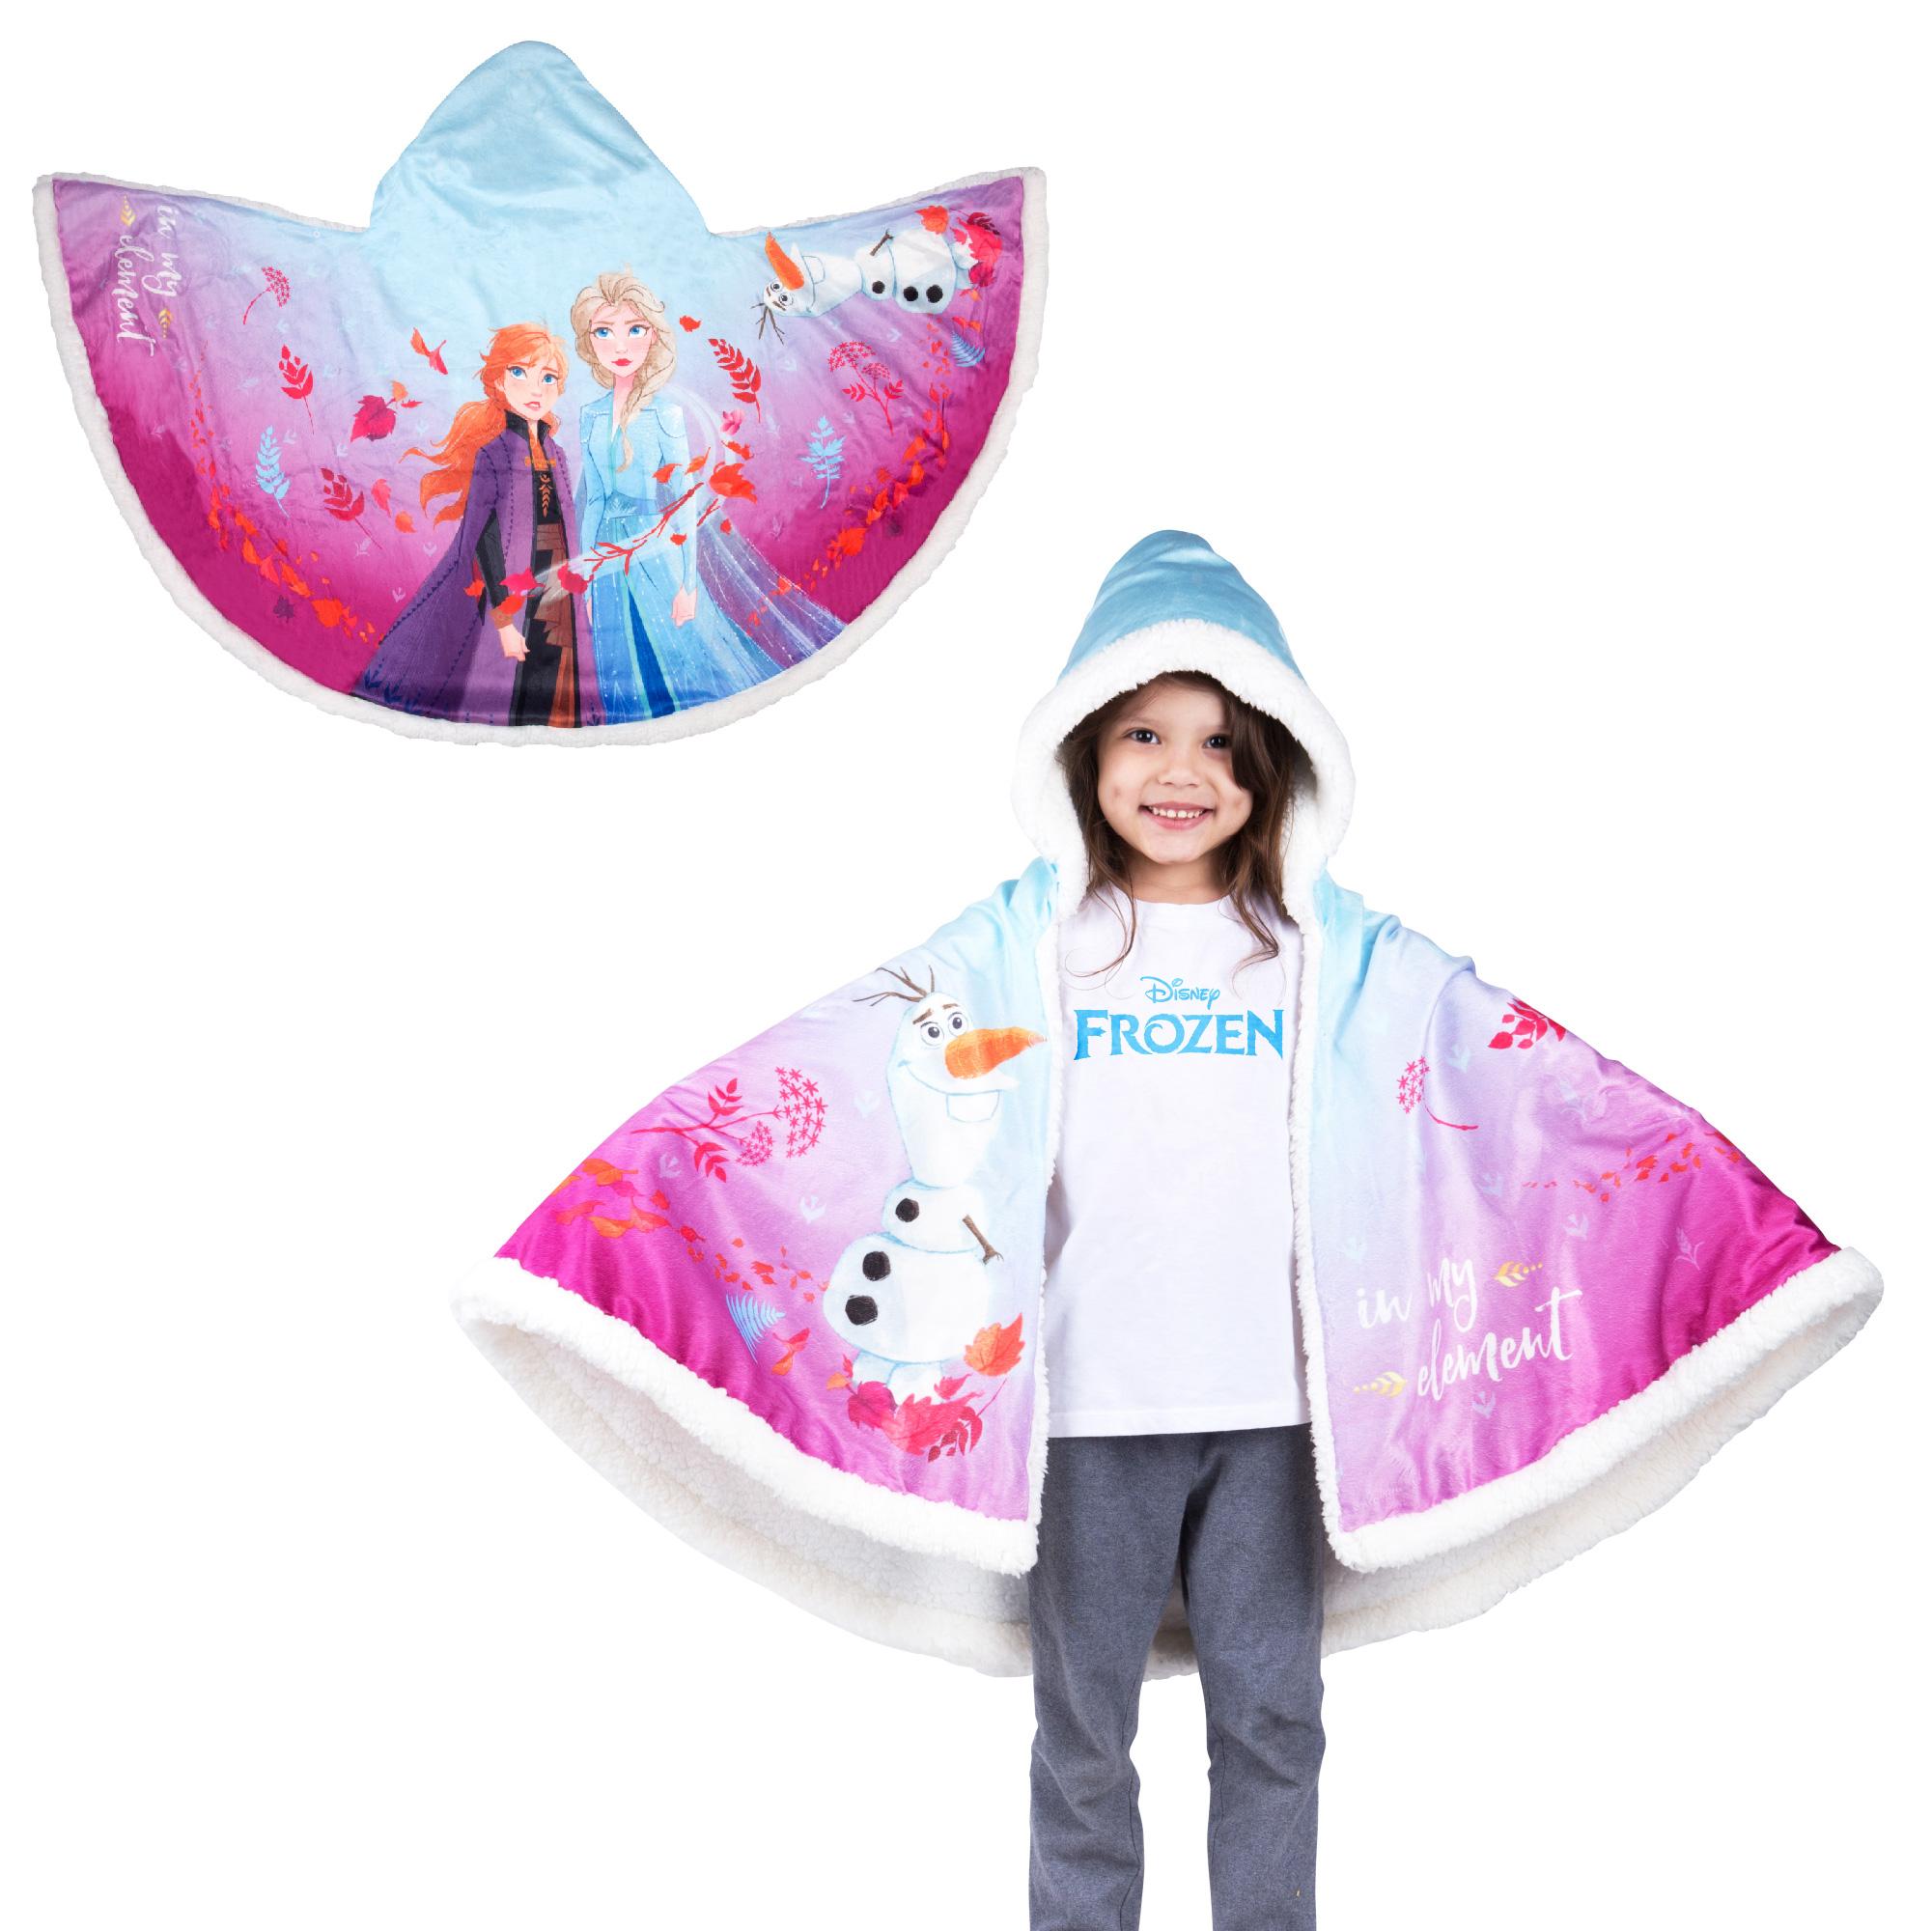 Snuggle Wrap Hoodie Blankets: Disney's Frozen 2 Olaf, Disney's Princesses, Batman & More + Free Store Pickup at Walmart $14.88